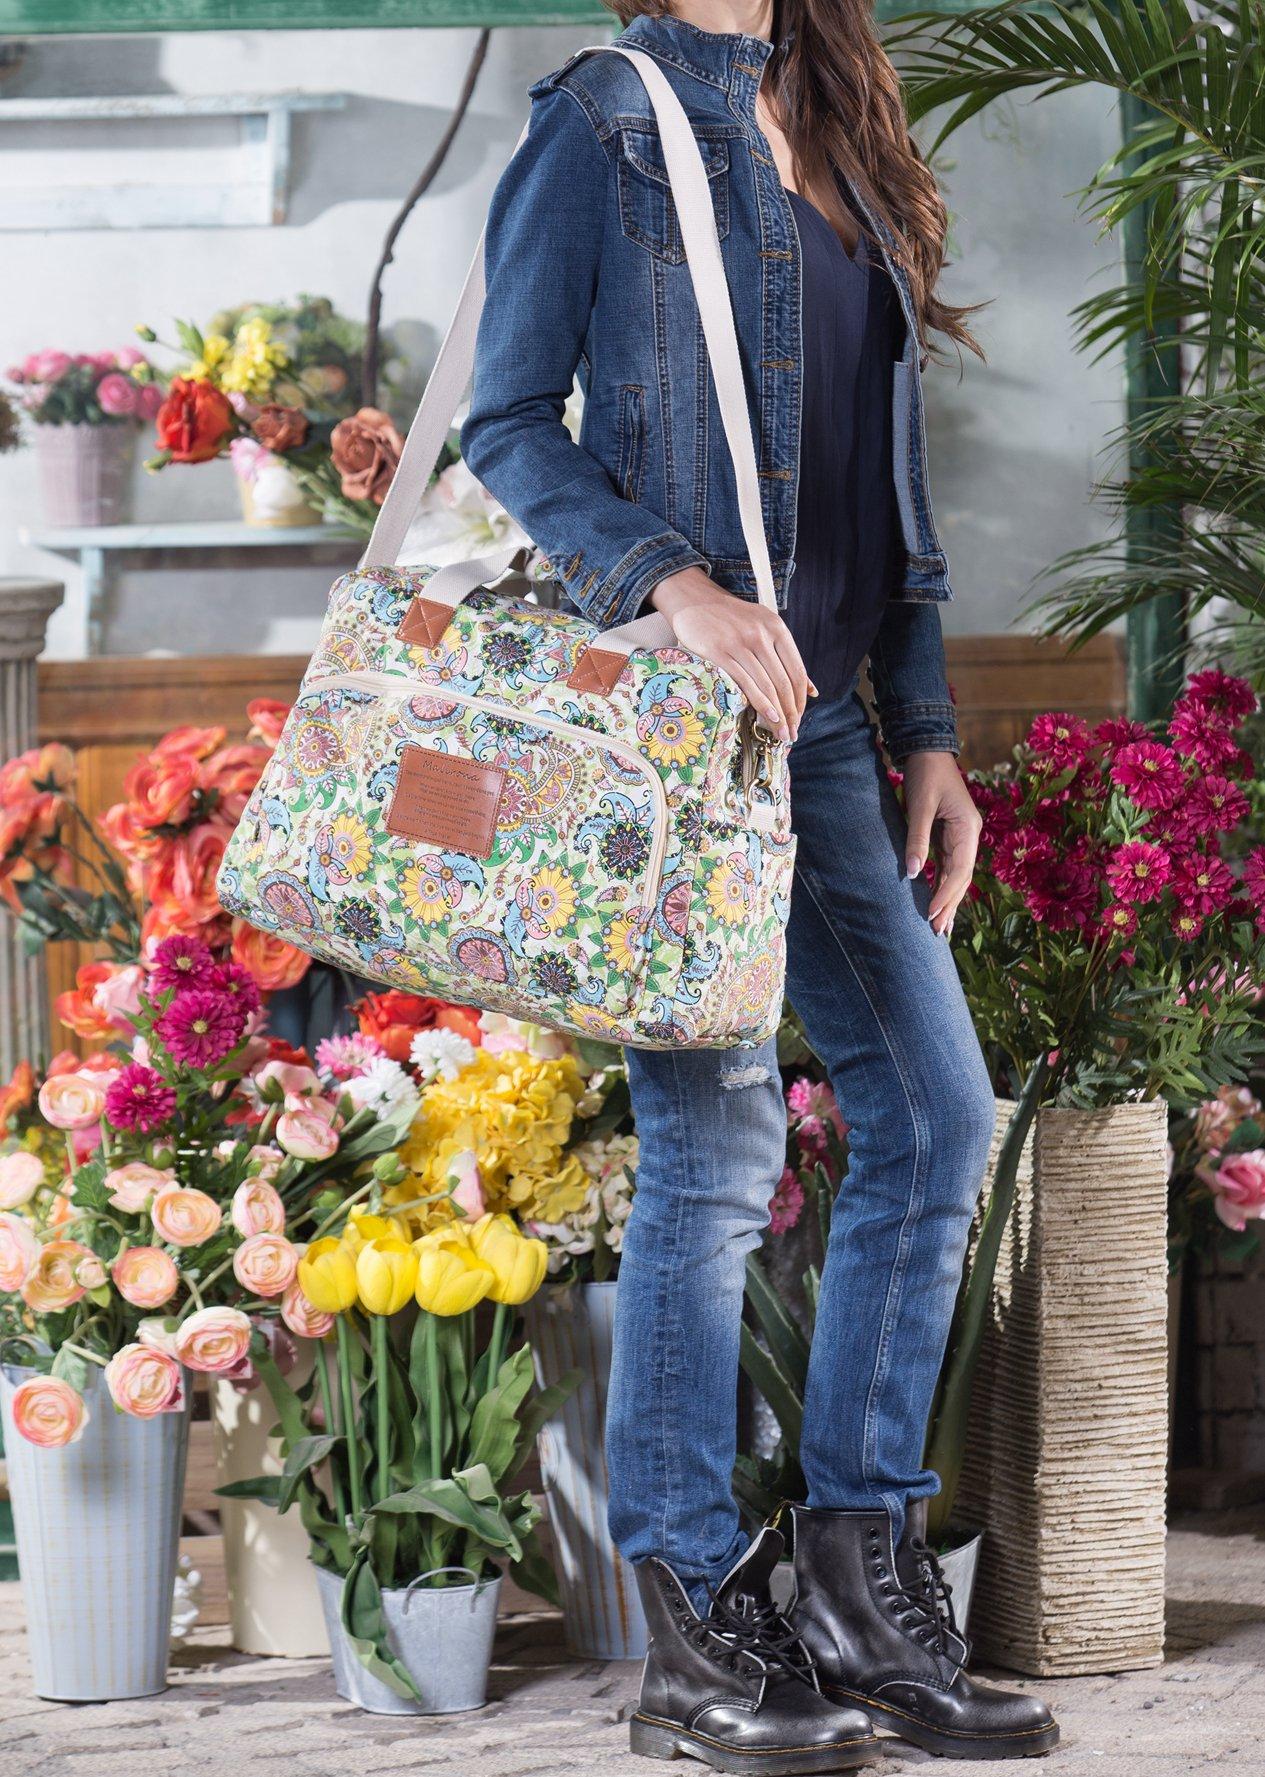 Malirona Canvas Overnight Bag Women Weekender Bag Carry On Travel Duffel Bag Floral Design (Flower) by Malirona (Image #3)